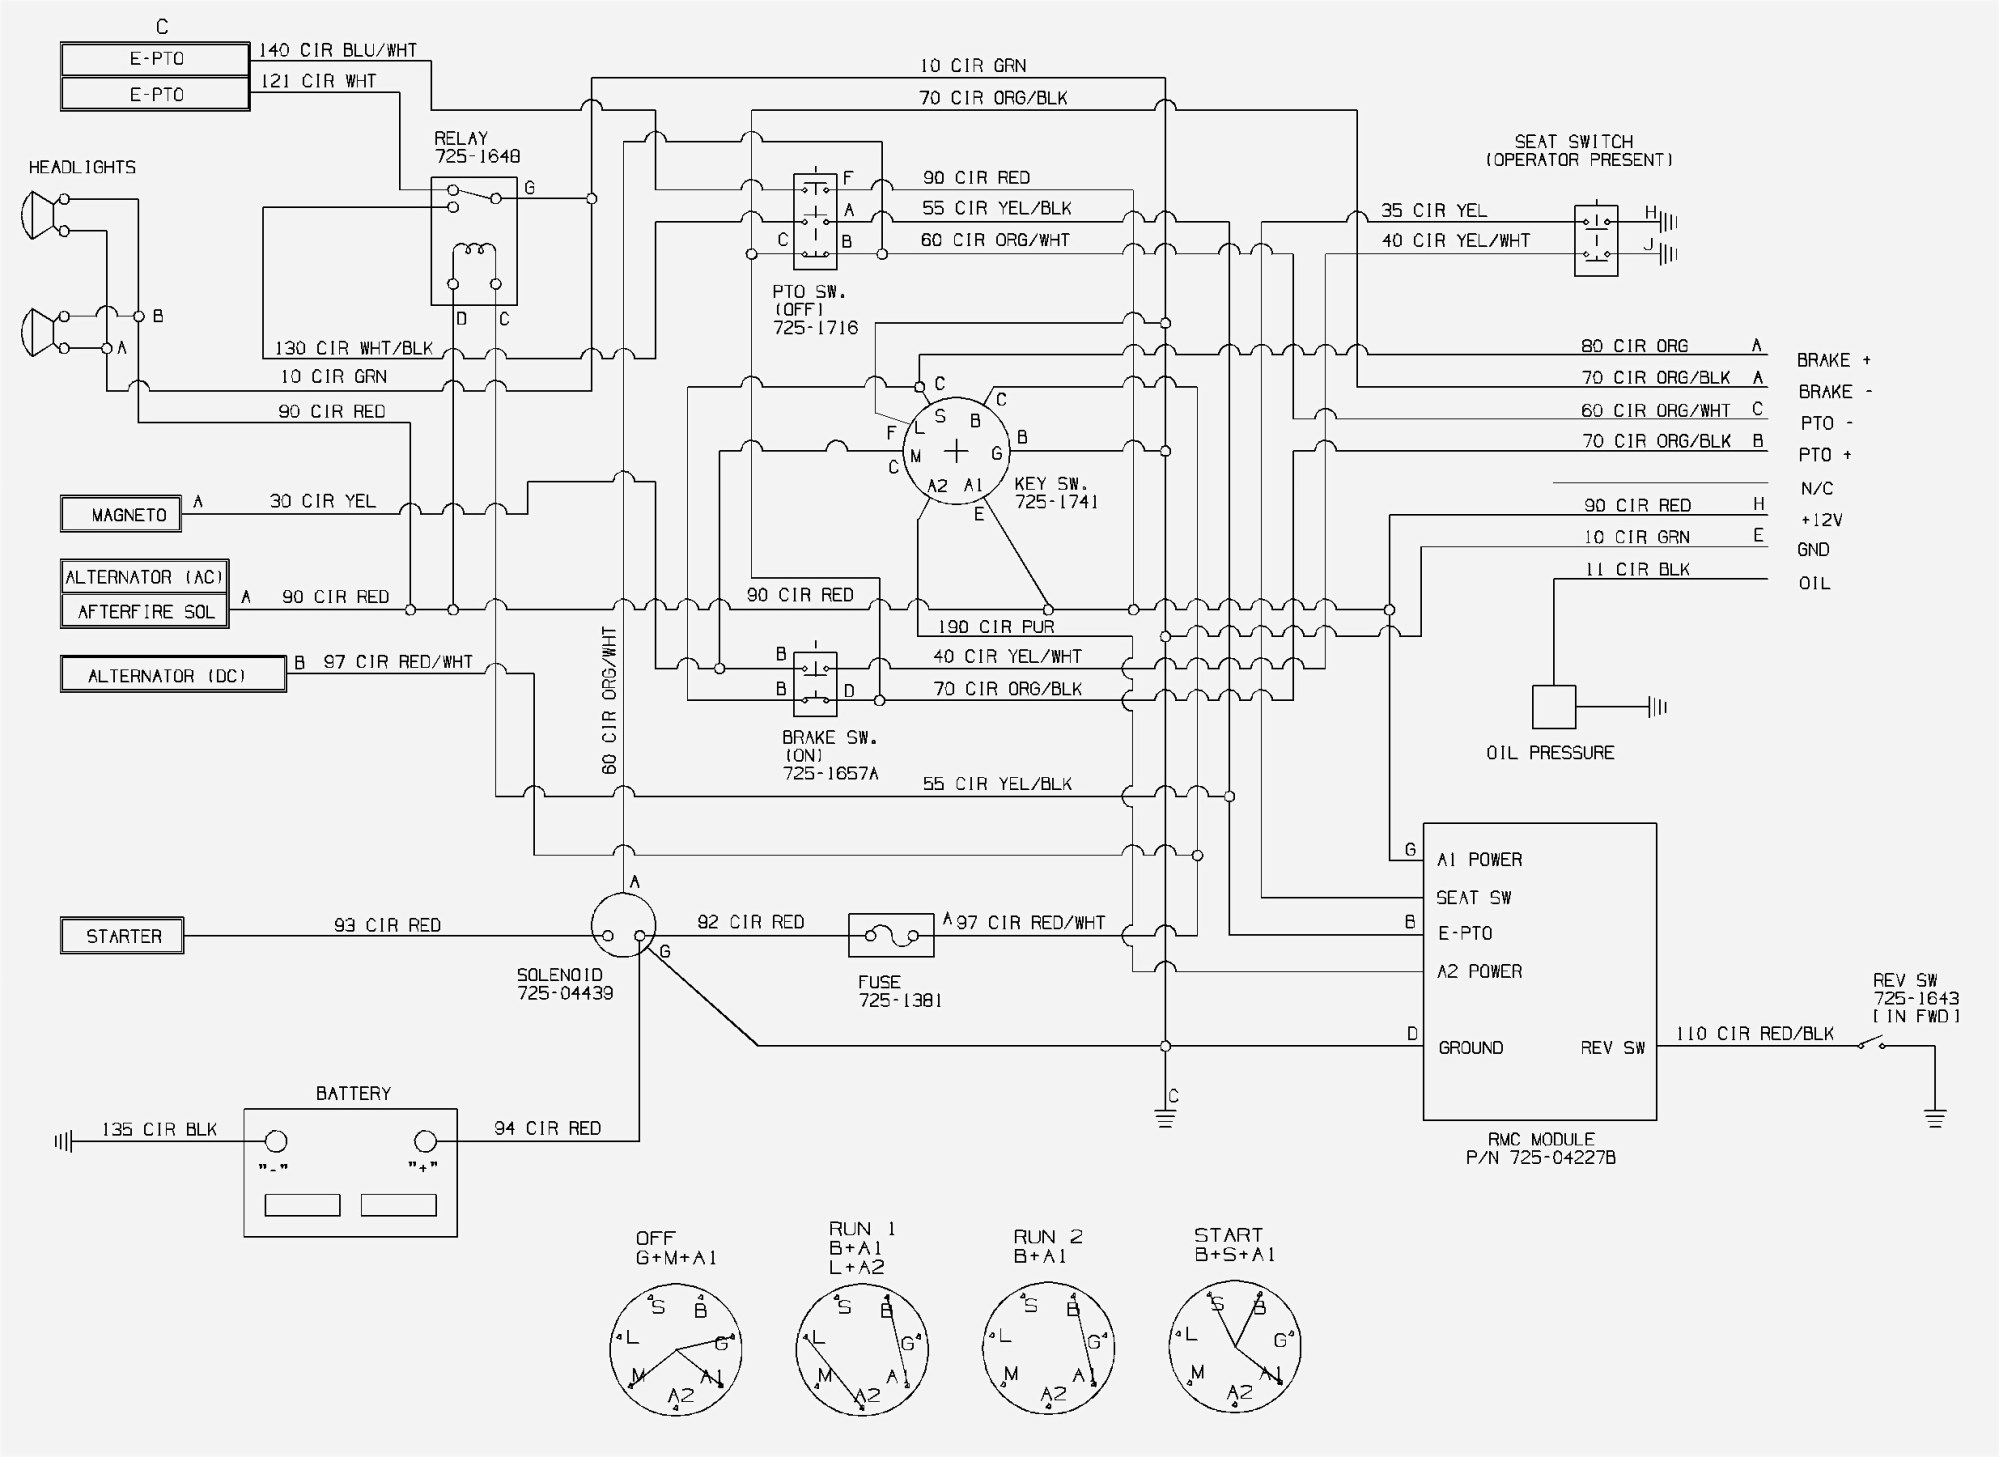 hight resolution of ford escape parts diagram ford cvt transmission wiring diagram wiring diagram of ford escape parts diagram ford escape parts diagram 2004 mazda 6 v6 engine